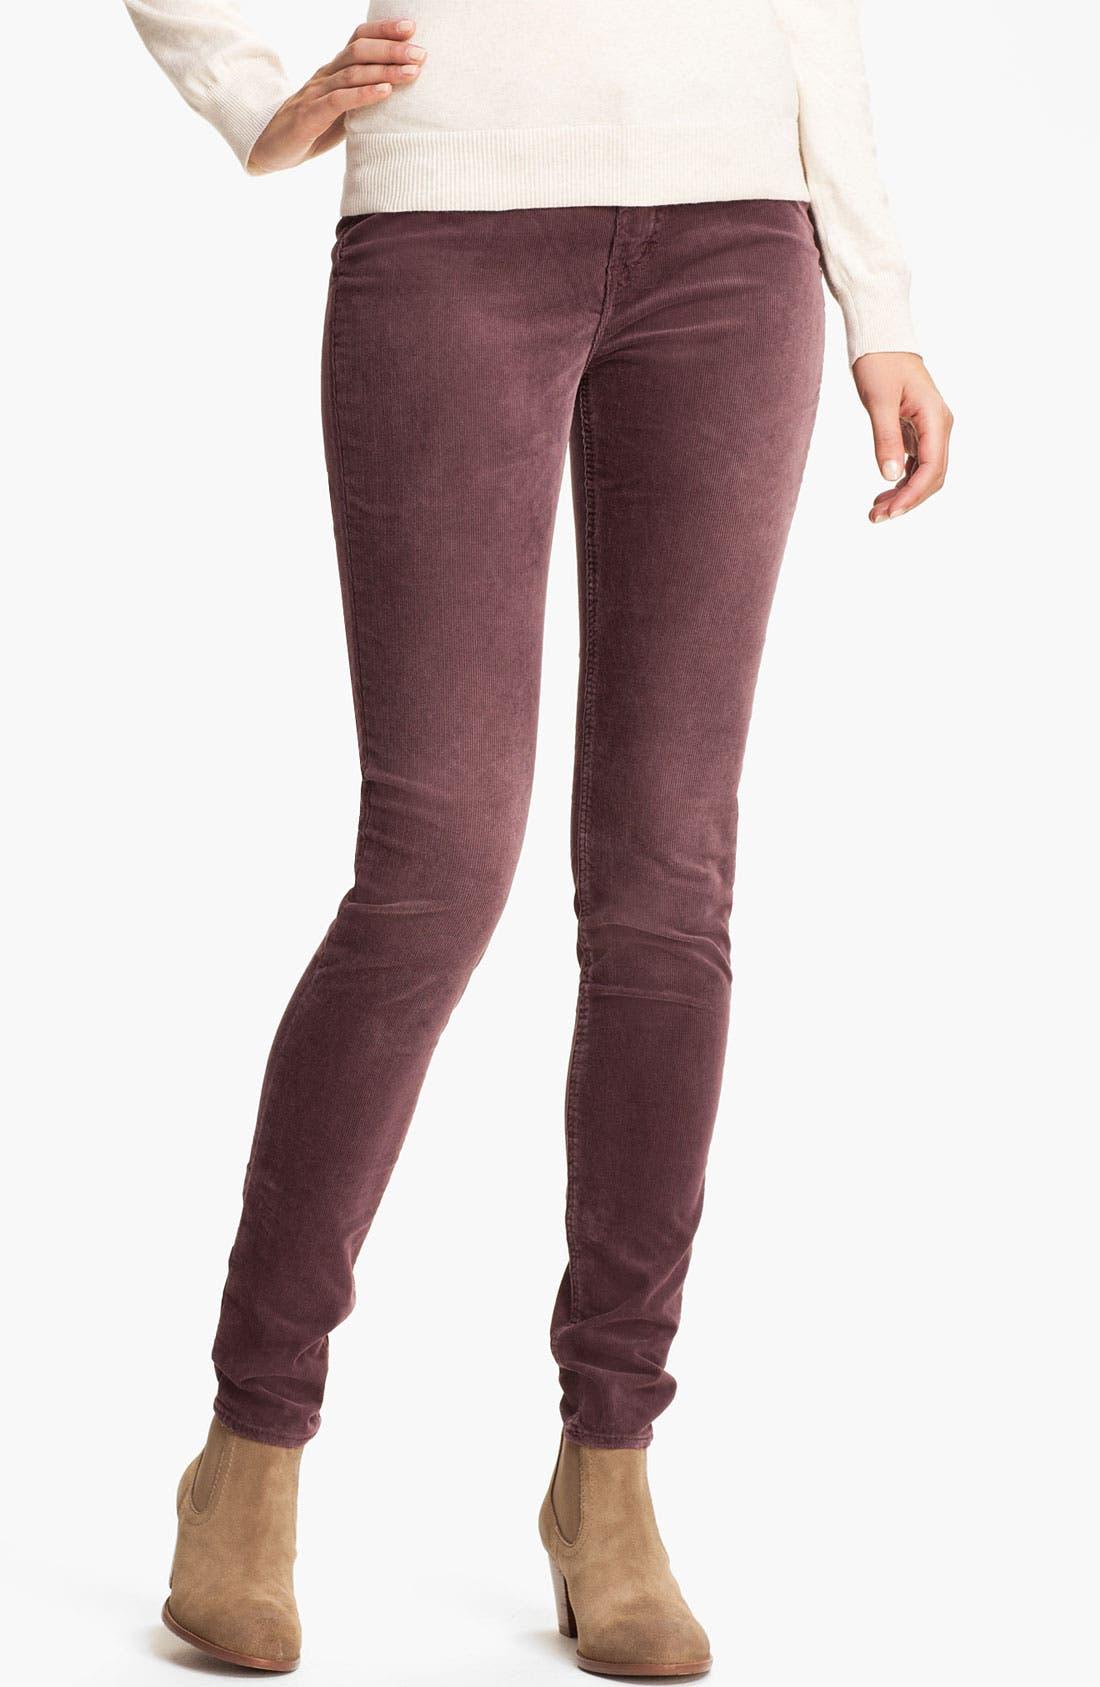 Main Image - Silver Jeans Co. 'Suki' Skinny Corduroy Pants (Juniors)